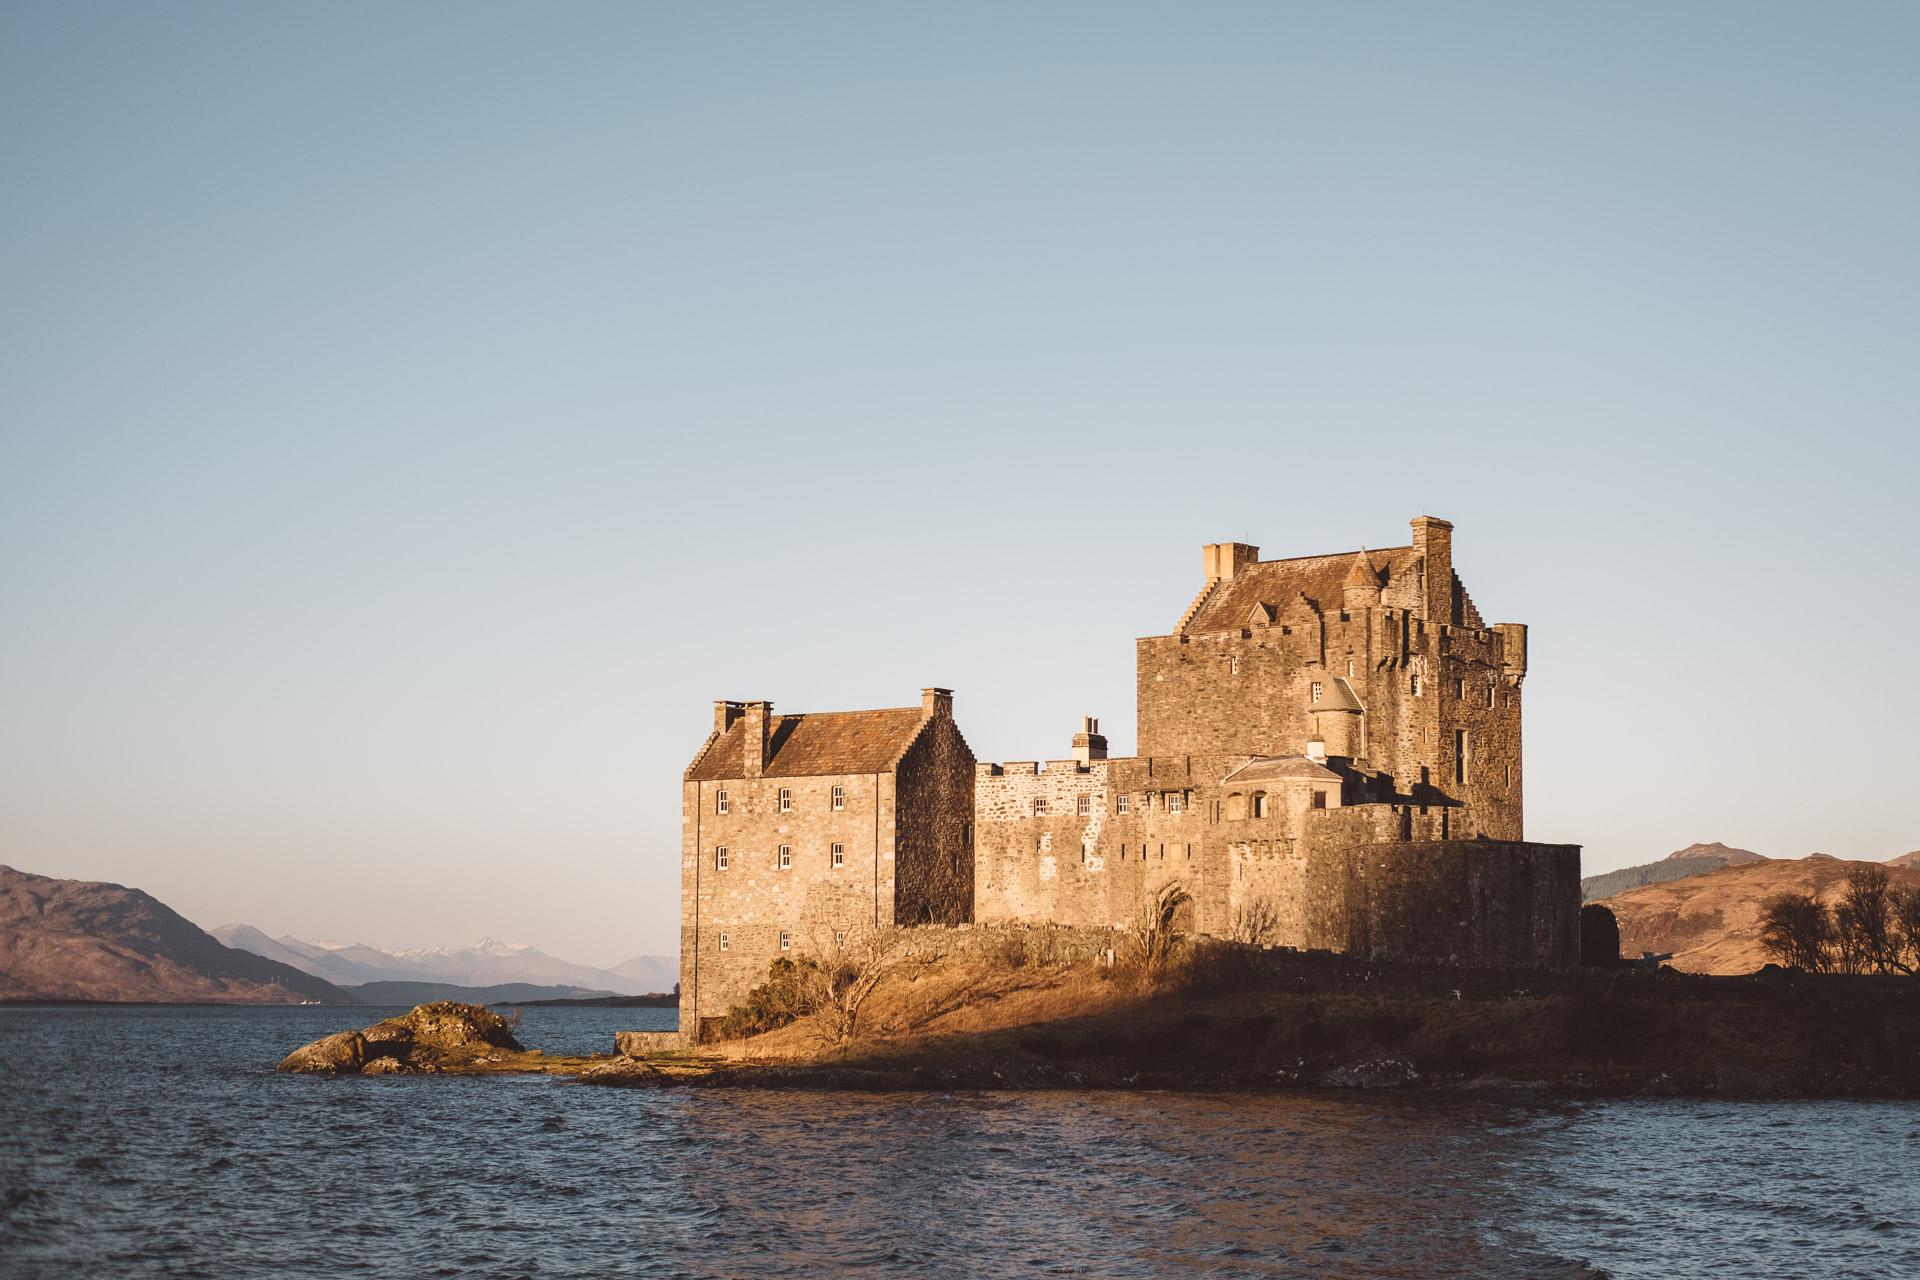 Scotland, Isle of Skye, Eilean Donan Castle